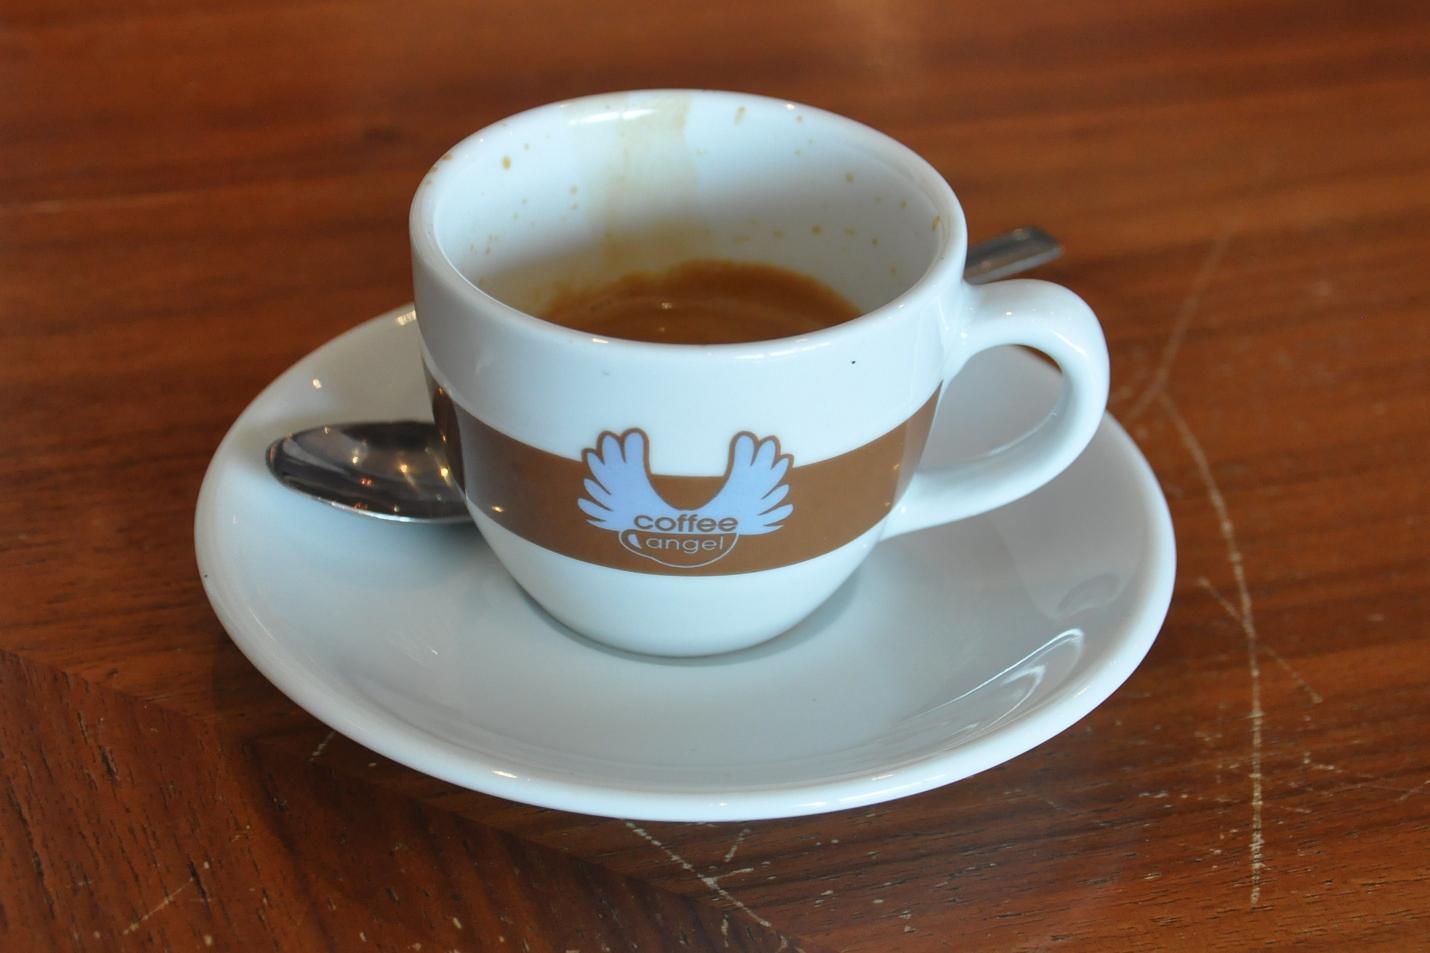 Espresso, the Coffee Angel way